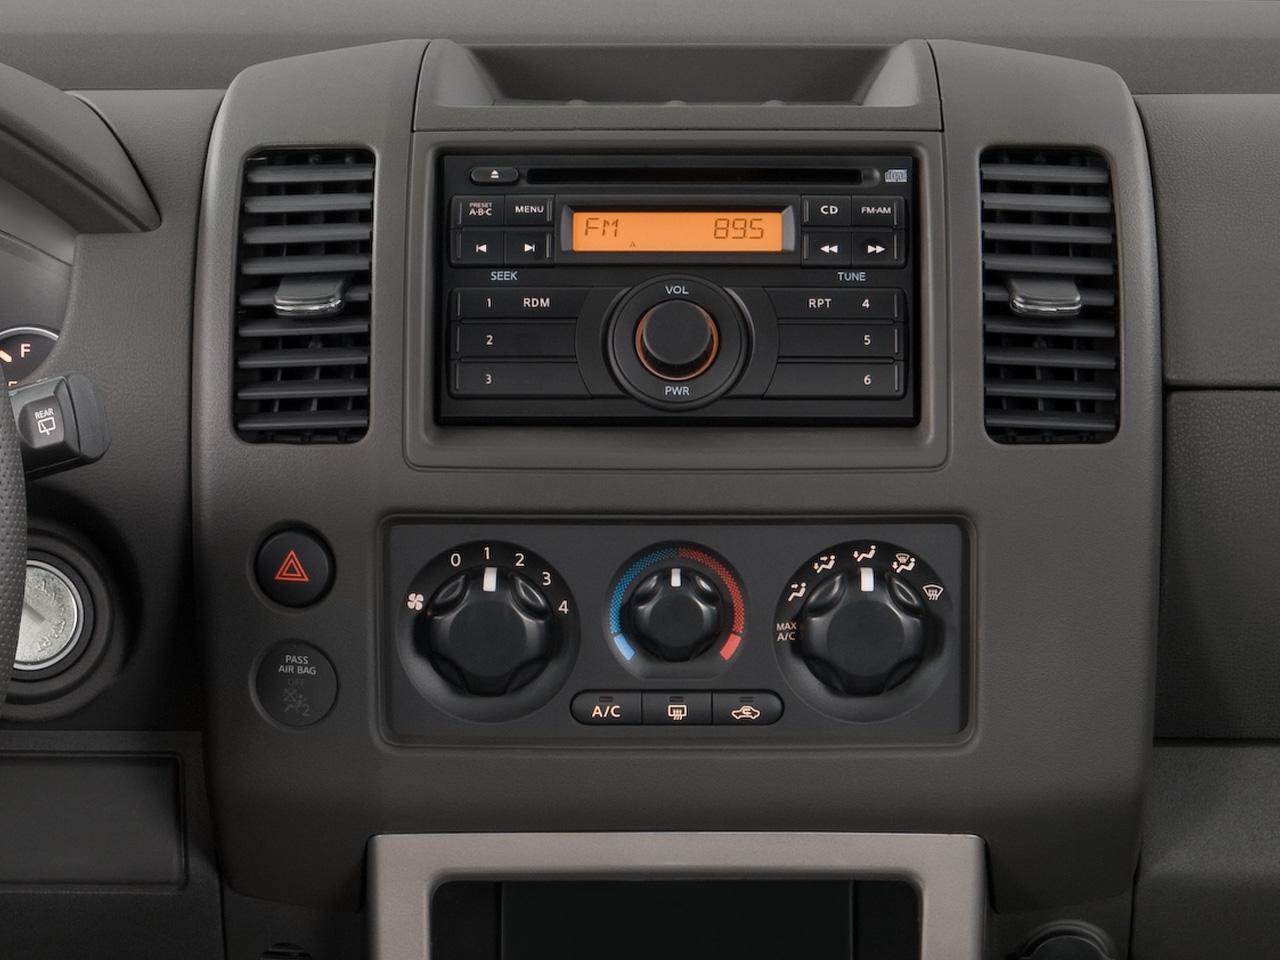 2008 Nissan Pathfinder SE - Nissan Midsize SUV Review - Automobile ...